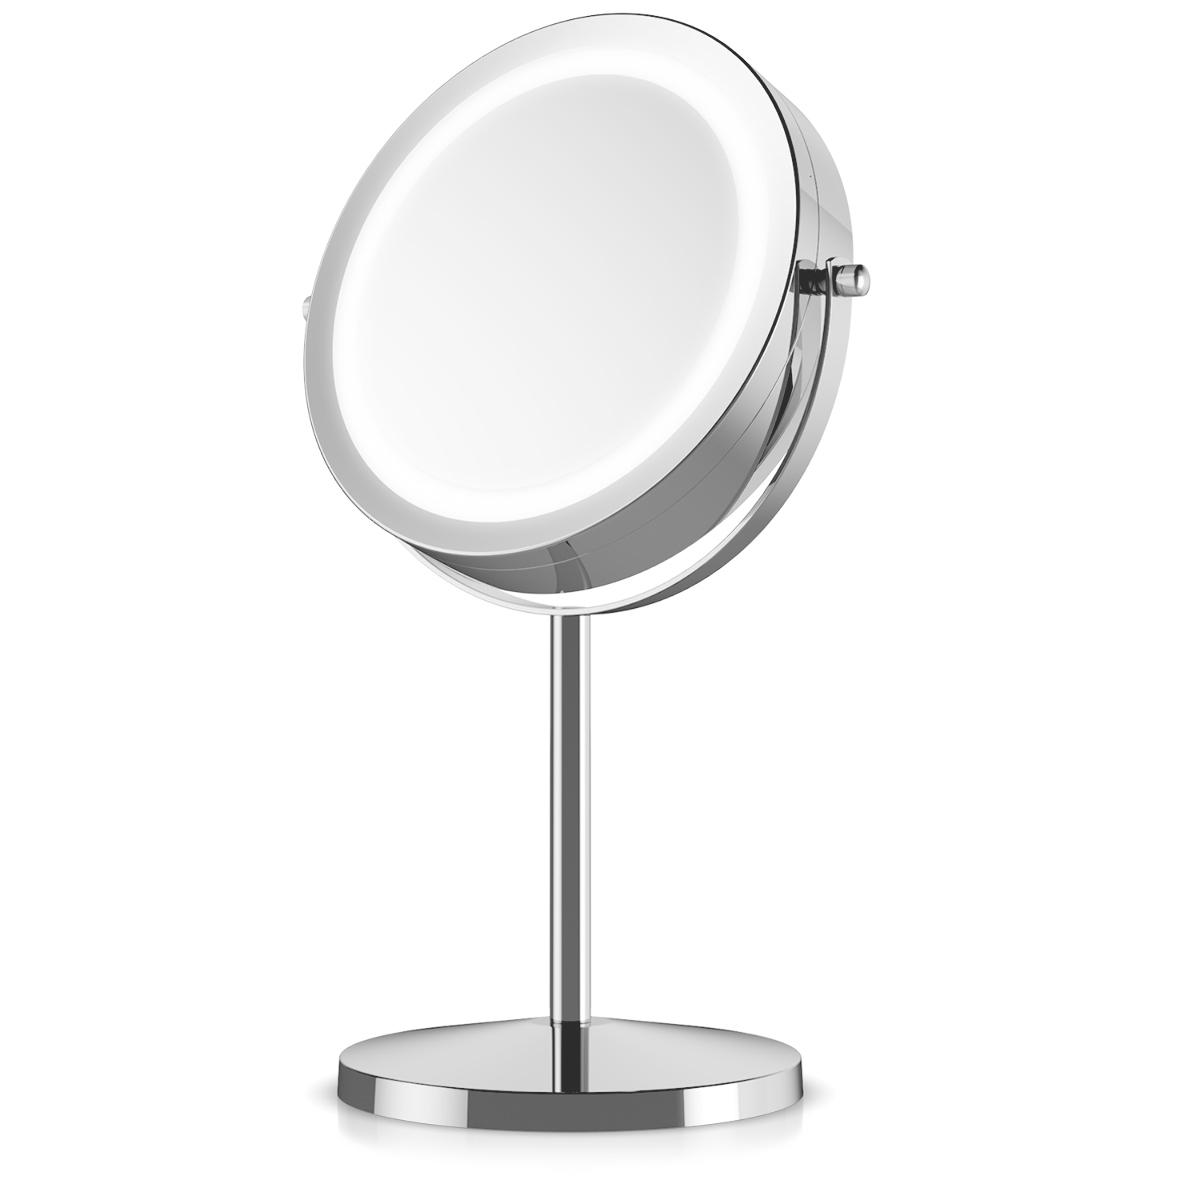 navaris led kosmetikspiegel mit 5 fach zoom beleuchteter drehbarer standspiegel ebay. Black Bedroom Furniture Sets. Home Design Ideas